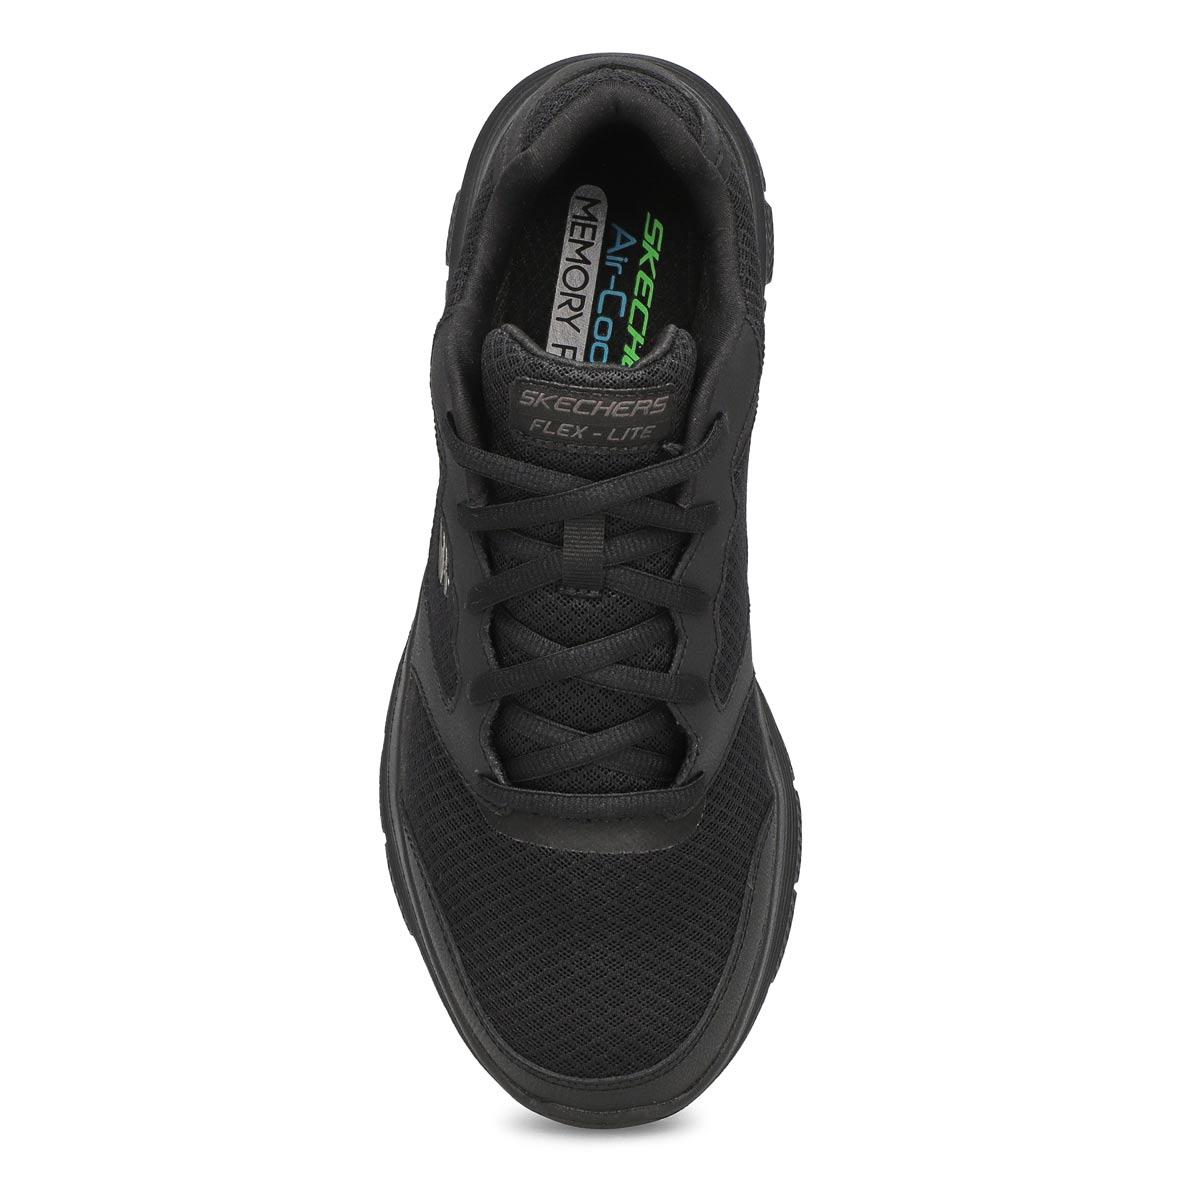 Men's Flex Advantage 4.0 Sneakers - Black/Black